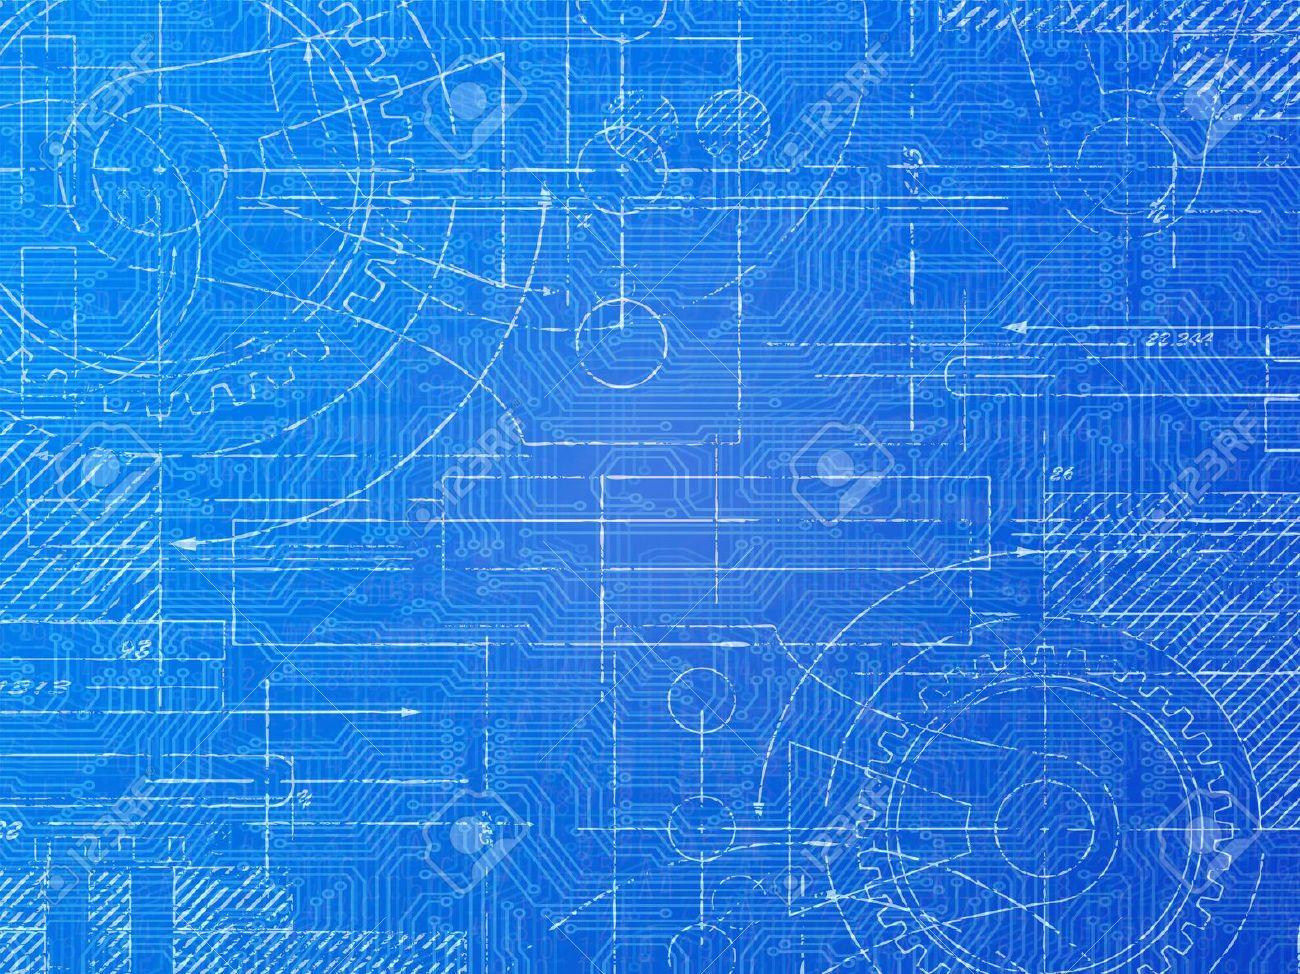 Technical Blueprint Electronics And Mechanical Background ...